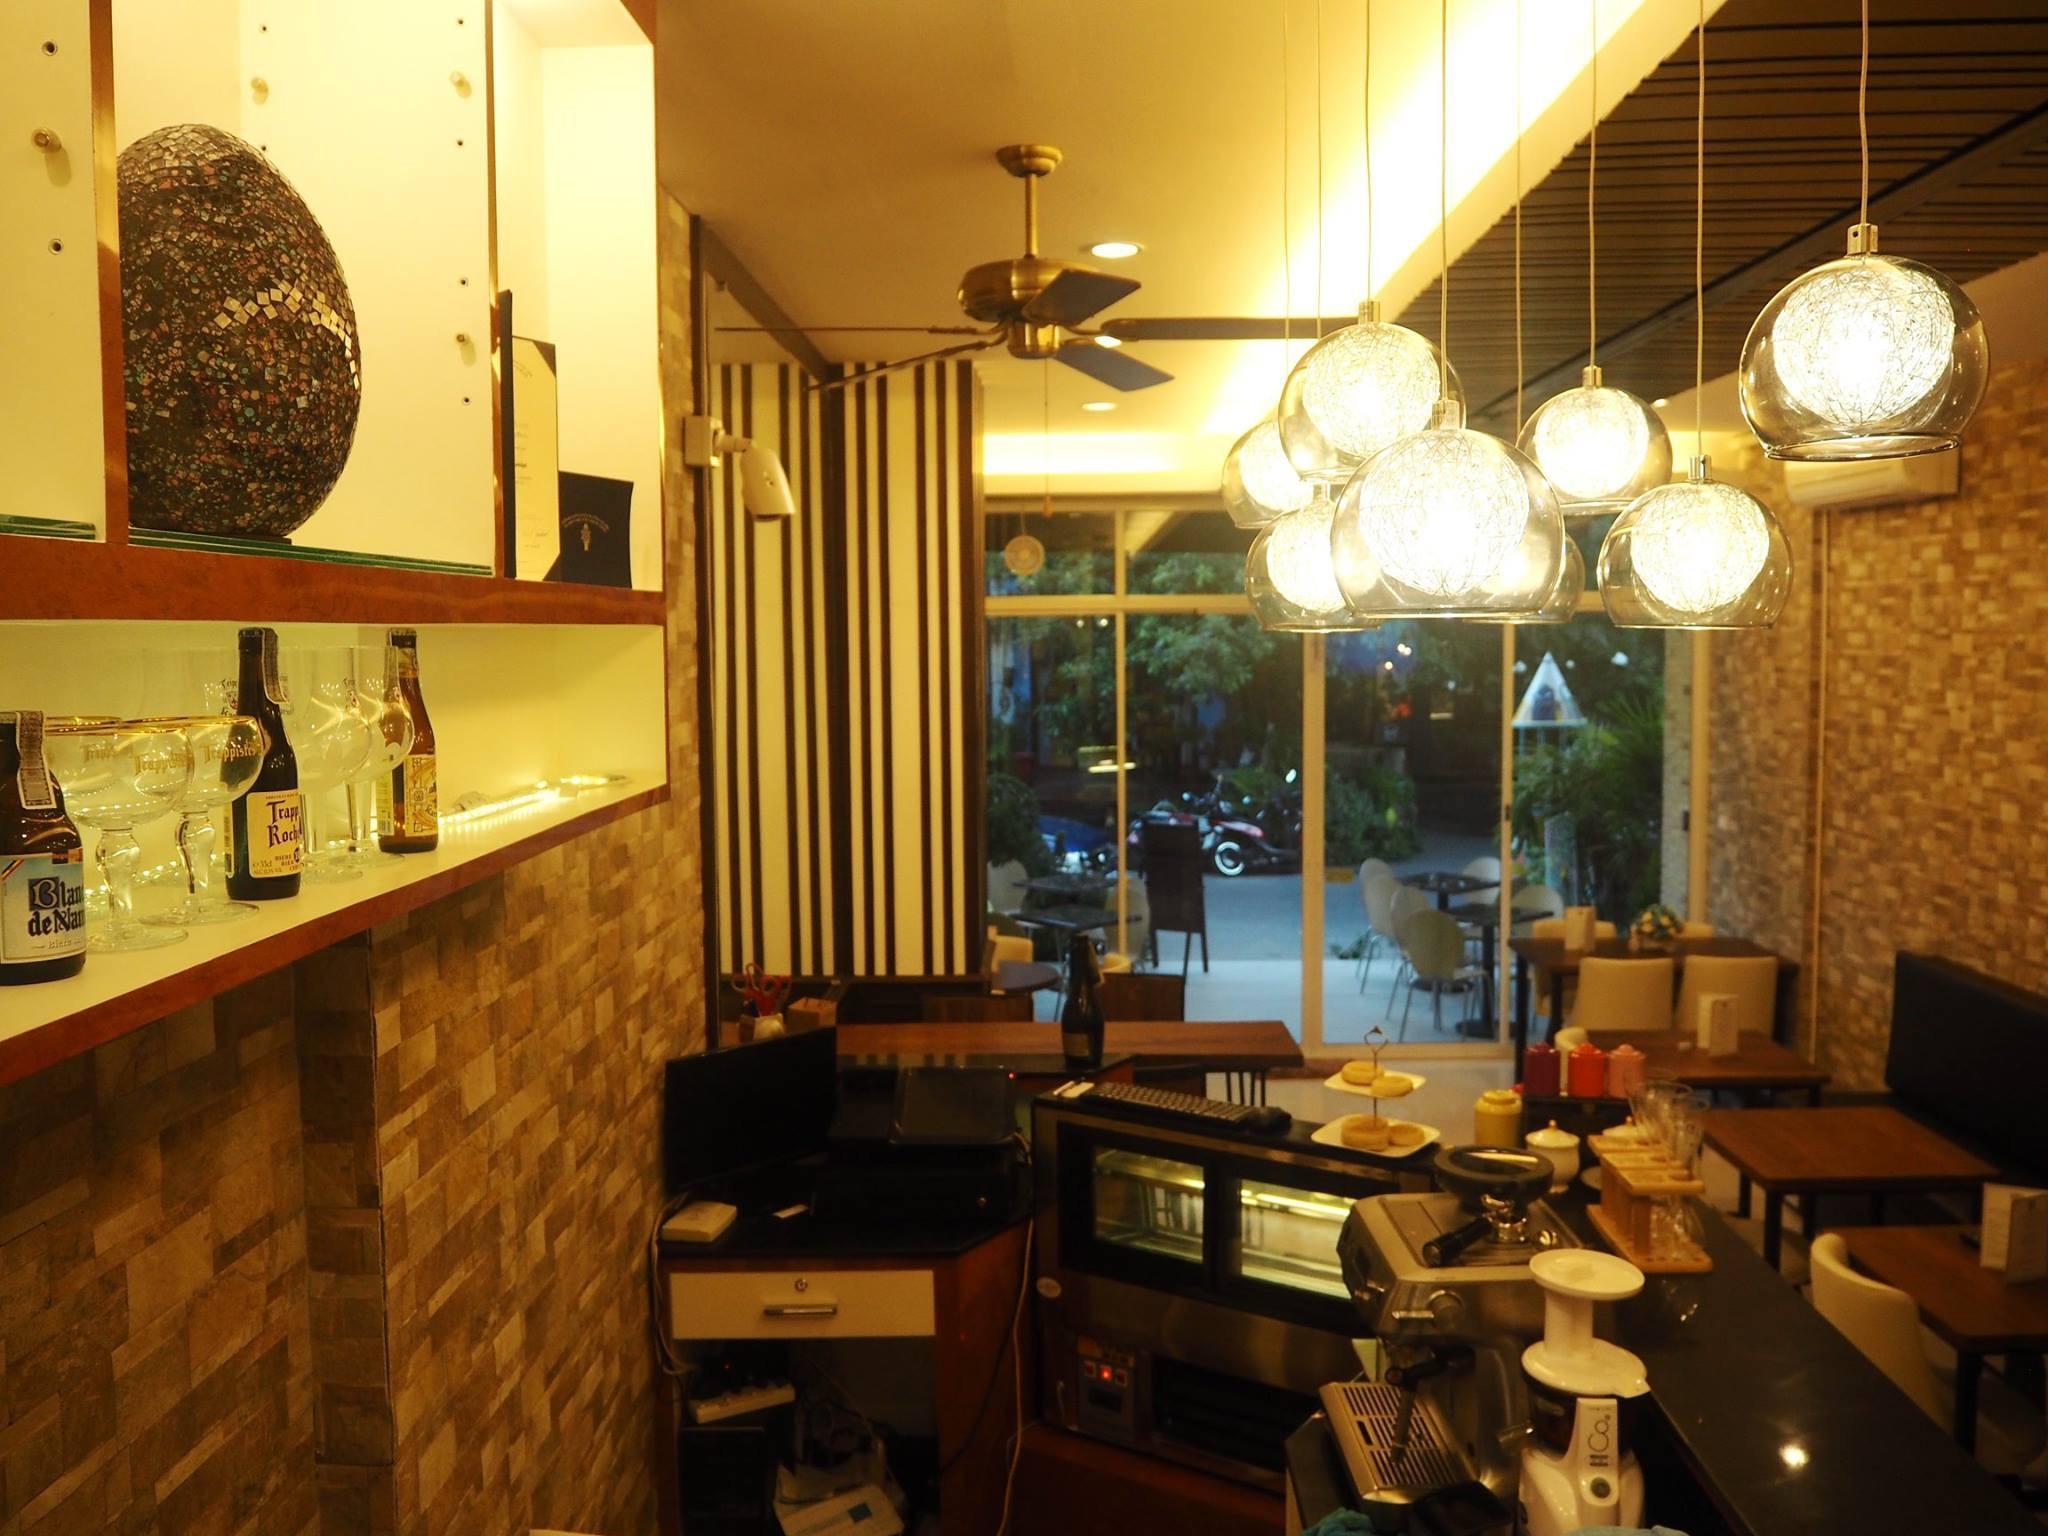 3 Bedrooms Entire Home @ Hip Street Nimman บ้านเดี่ยว 3 ห้องนอน 4 ห้องน้ำส่วนตัว ขนาด 181 ตร.ม. – นิมมานเหมินทร์